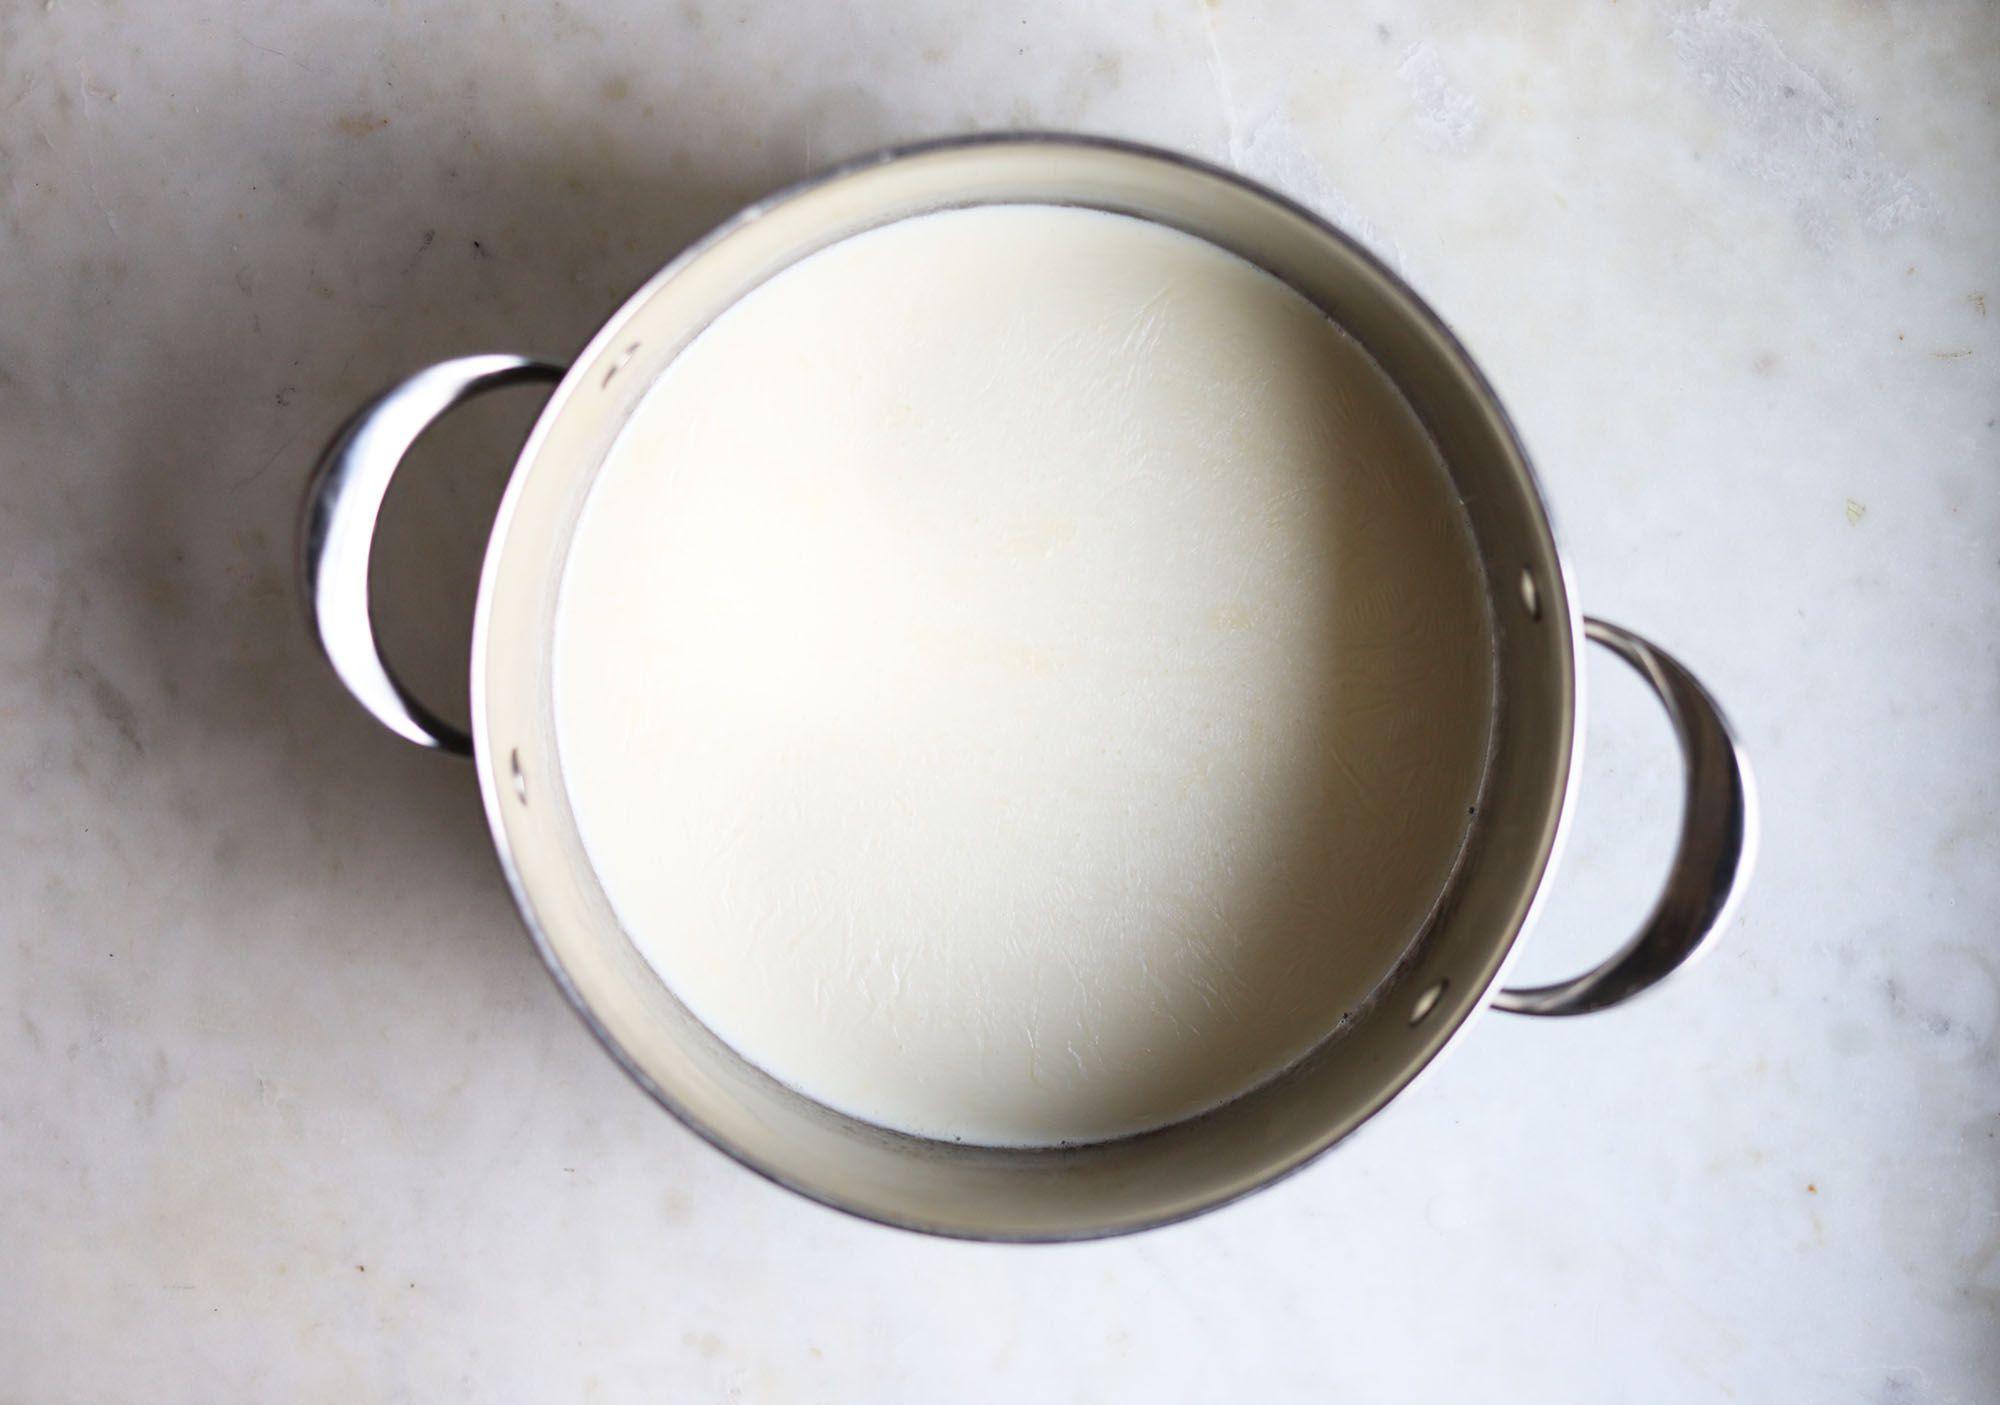 milk heating in a saucepan